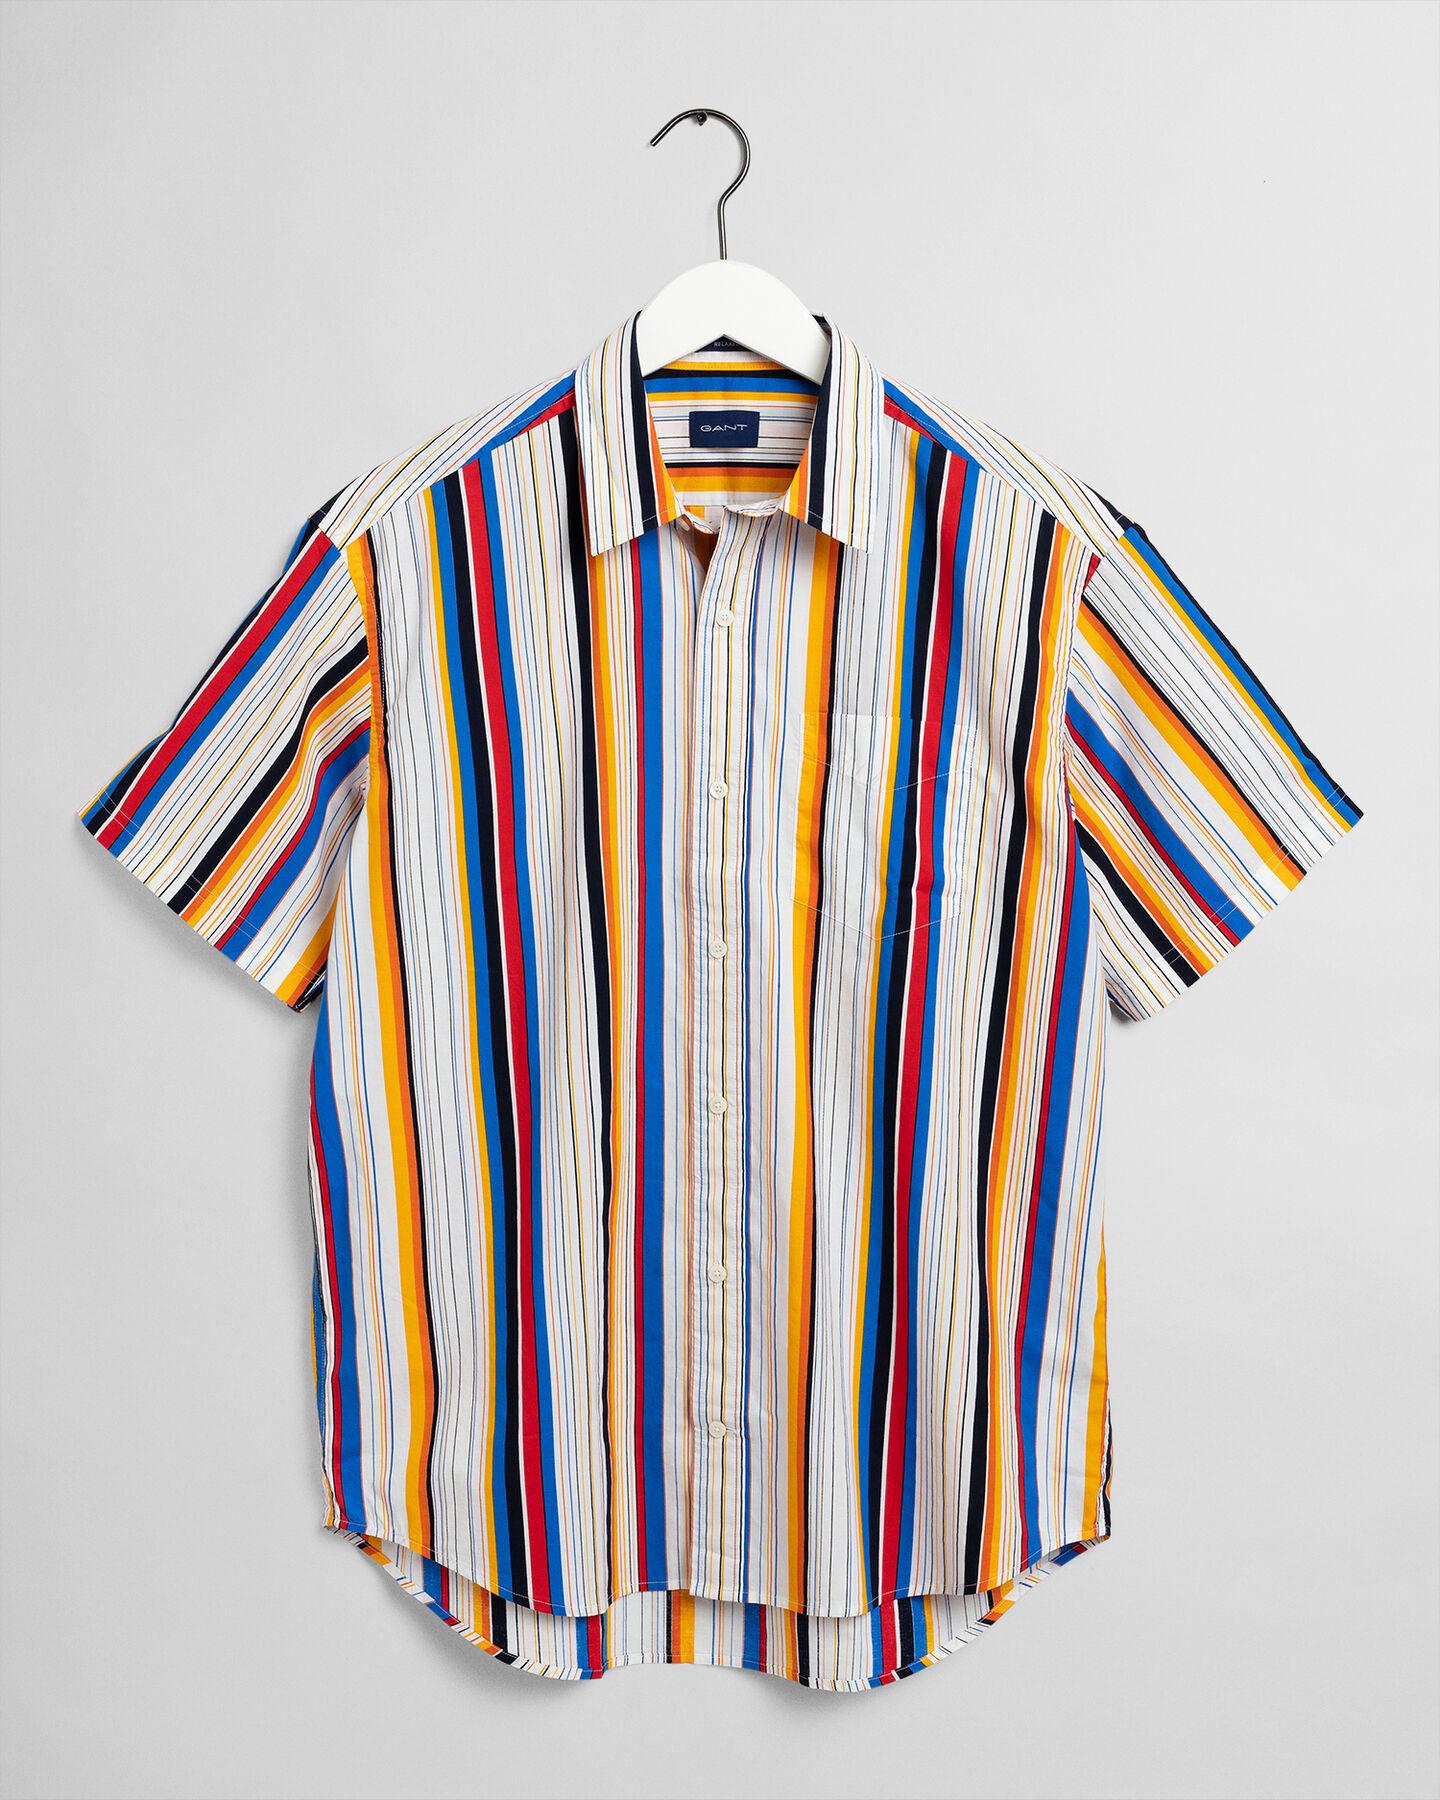 Relaxed Fit Hemd mit markantem Streifen